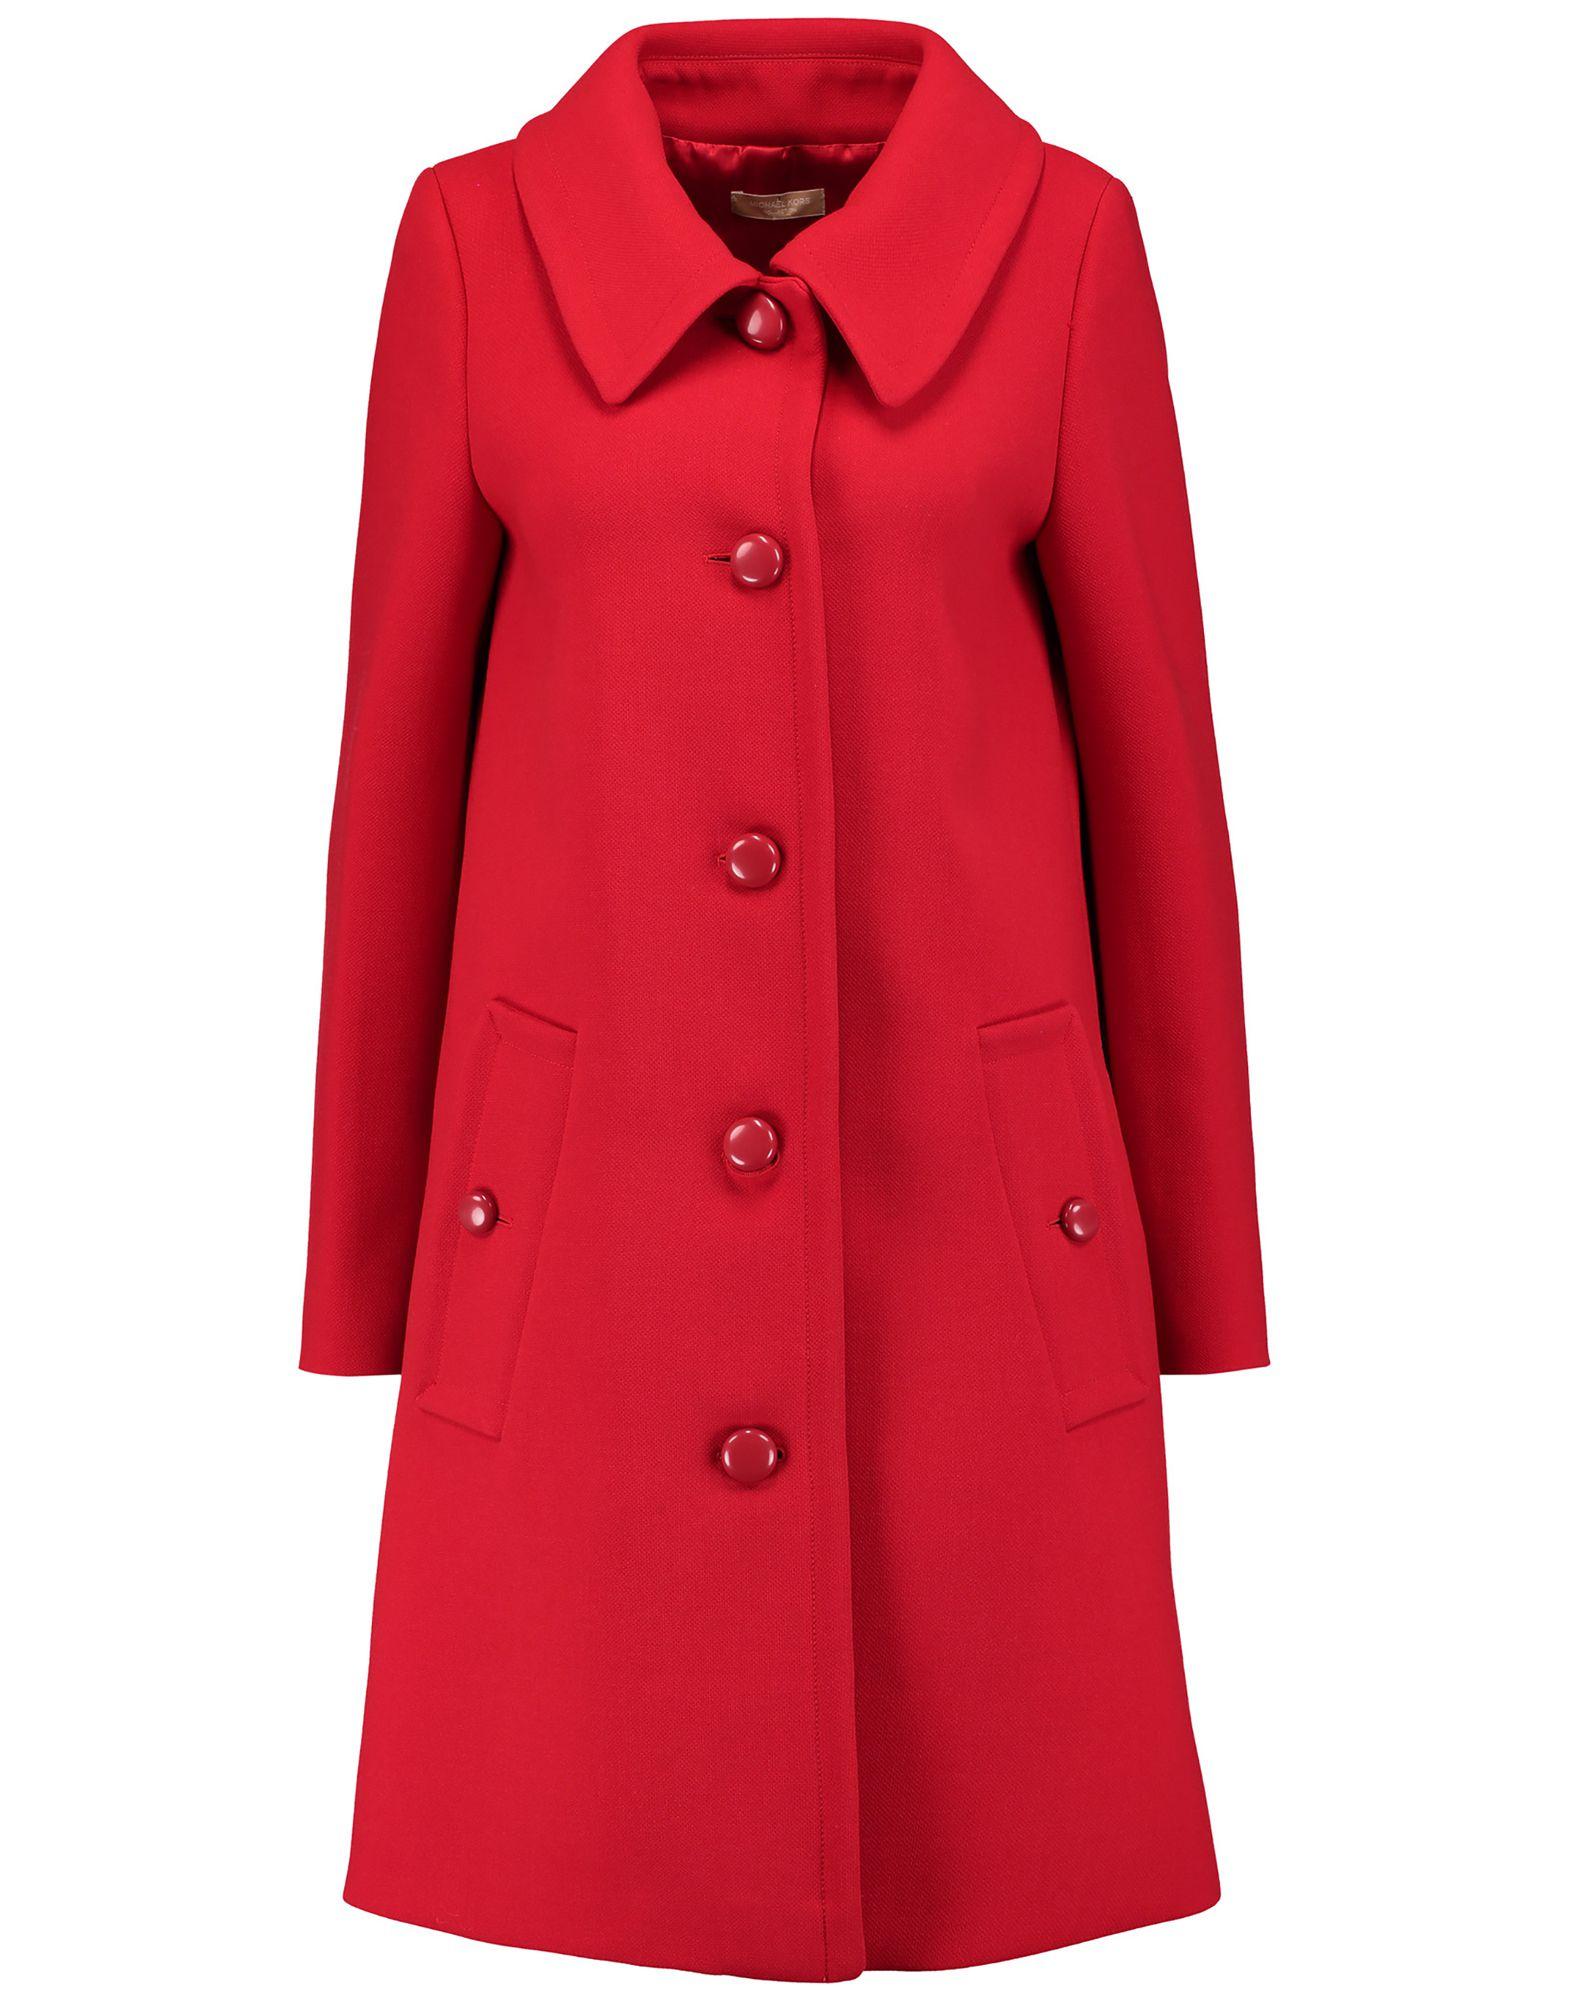 MICHAEL KORS COLLECTION Пальто michael michael kors легкое пальто